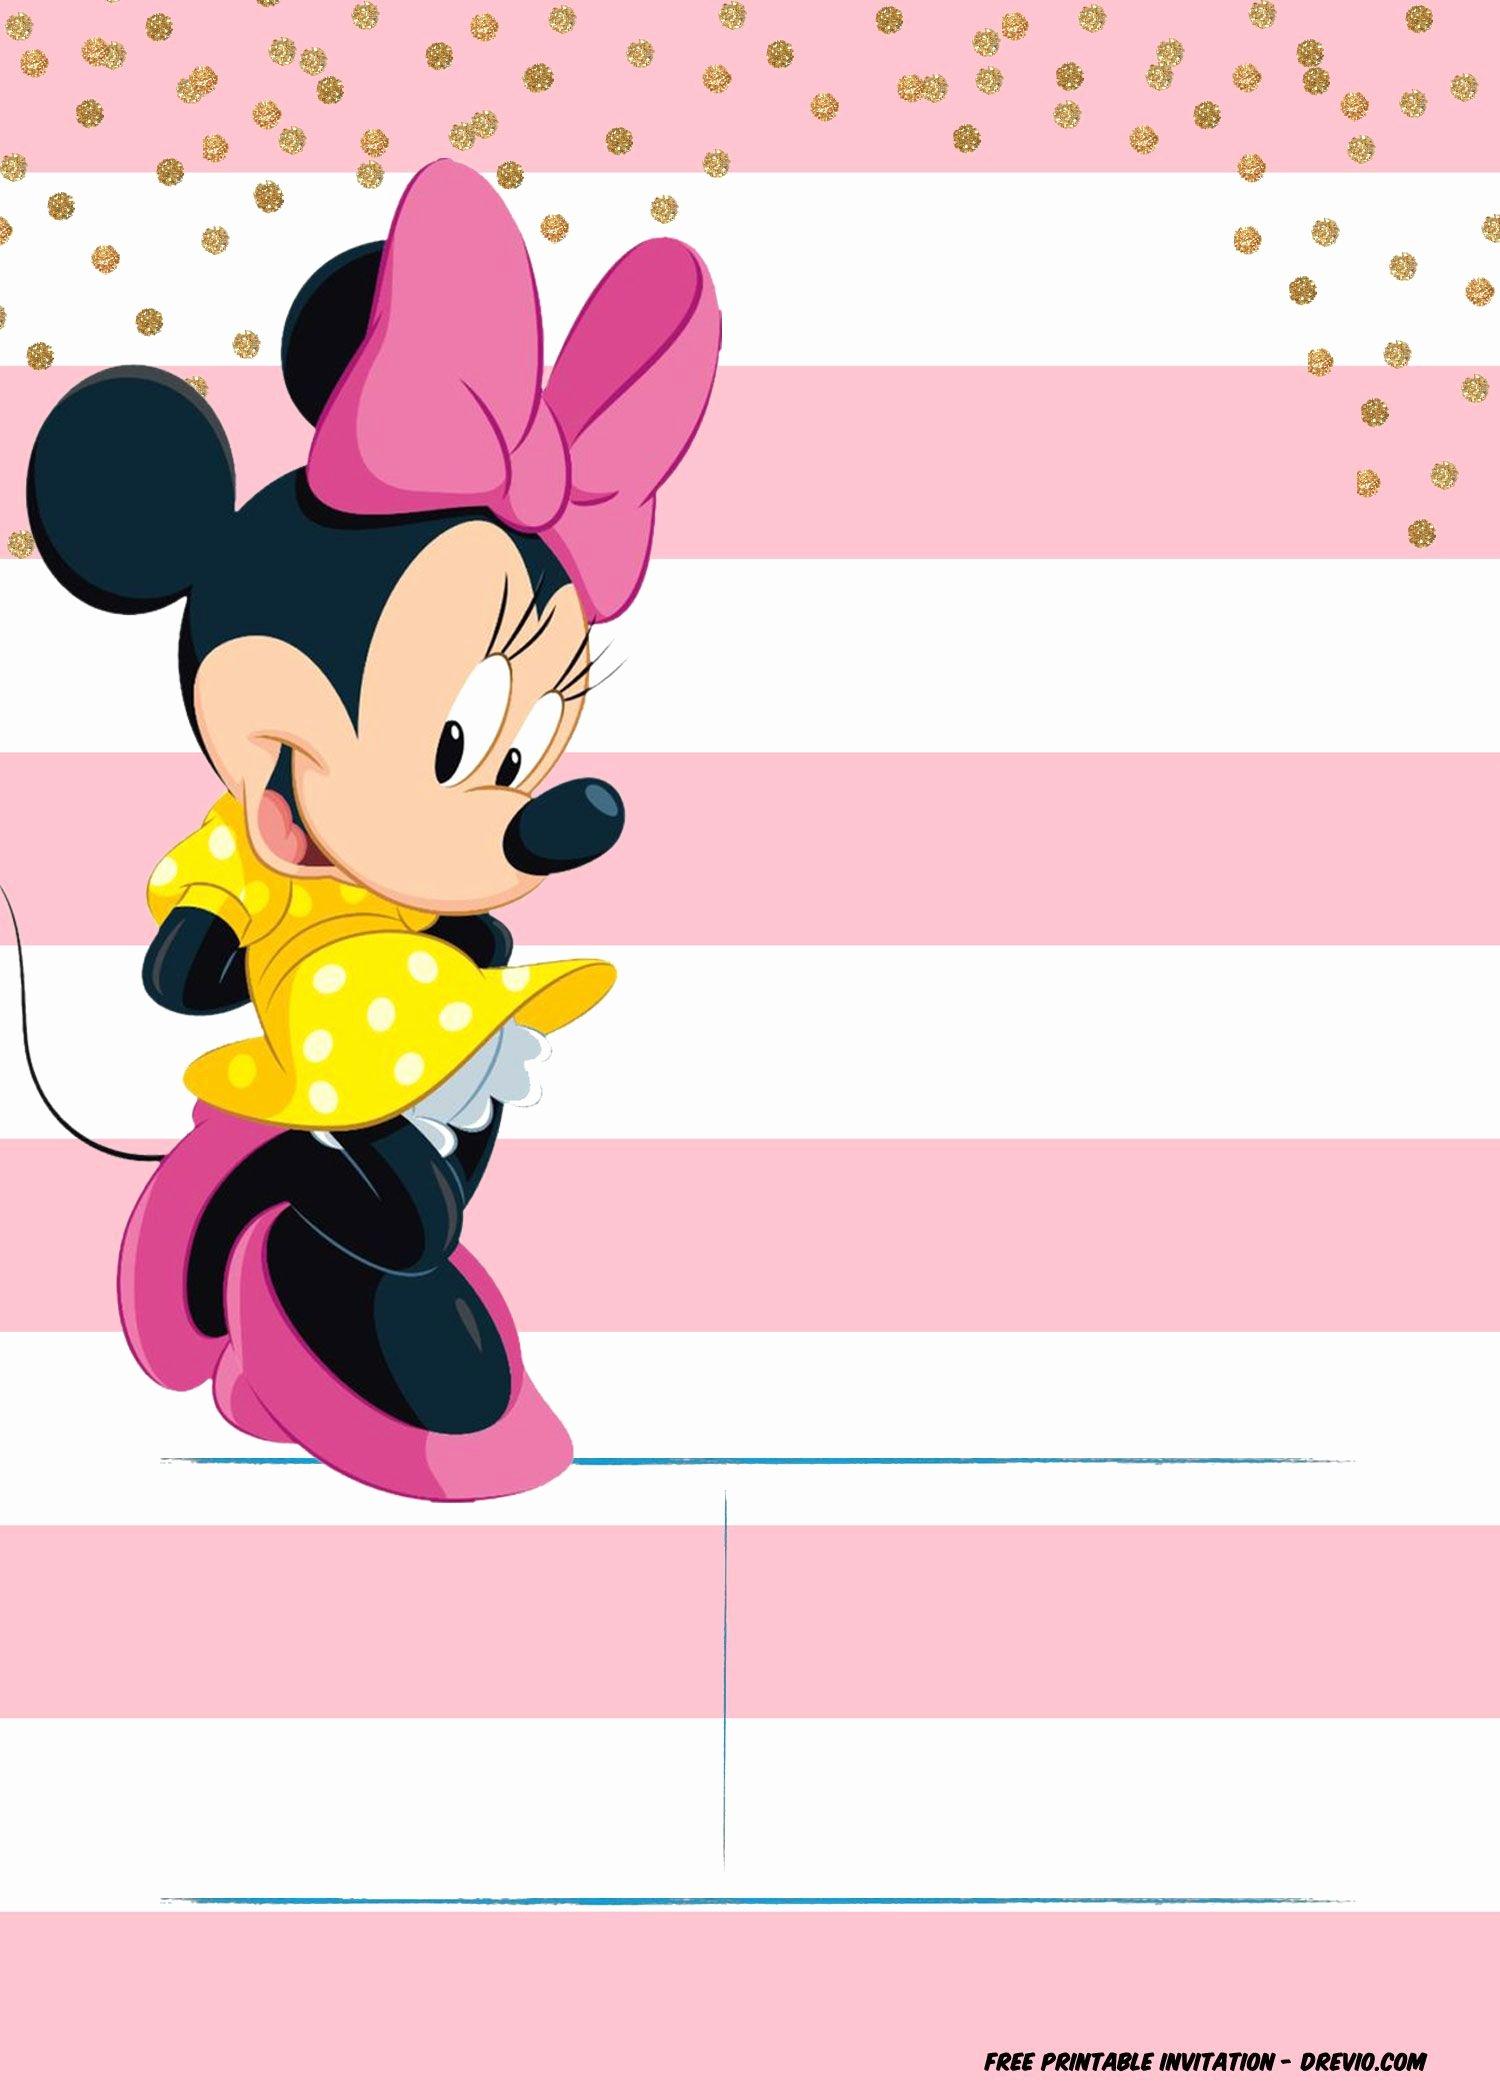 Minnie Mouse Invitation Template Fresh Minnie Mouse Invitation Template Editable and Free